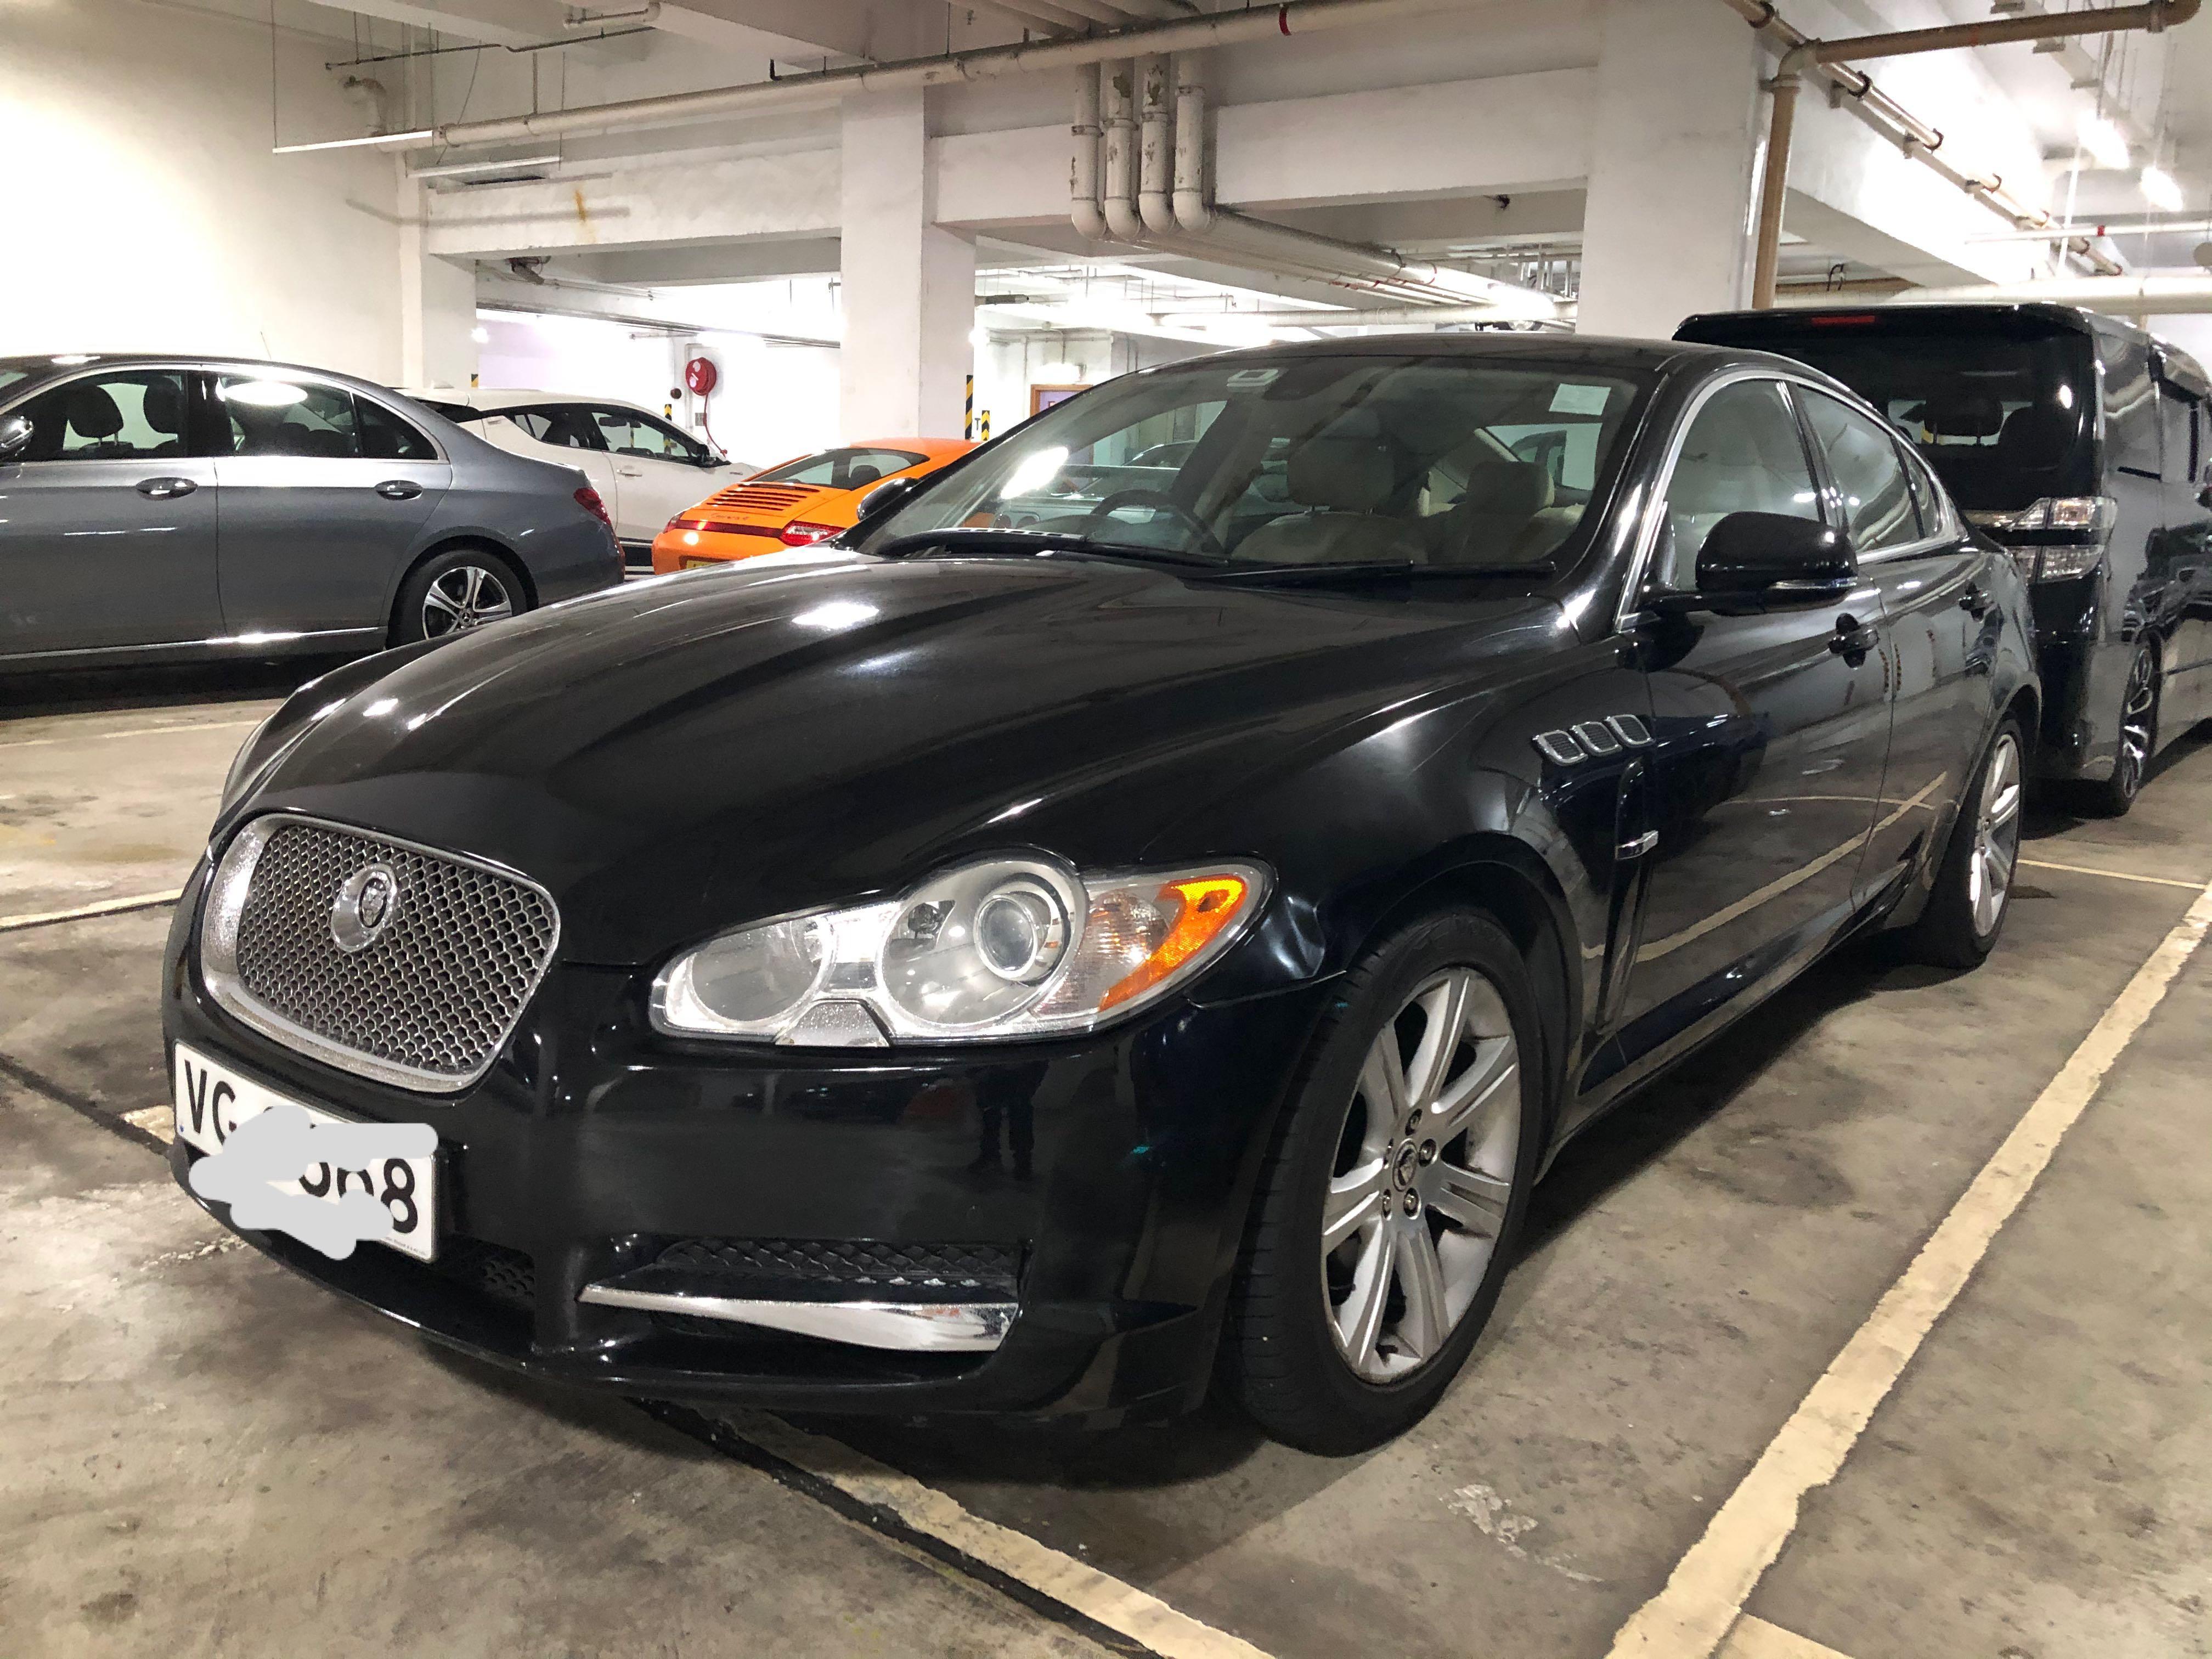 Jaguar XF 3.0 V6 Luxury (A)